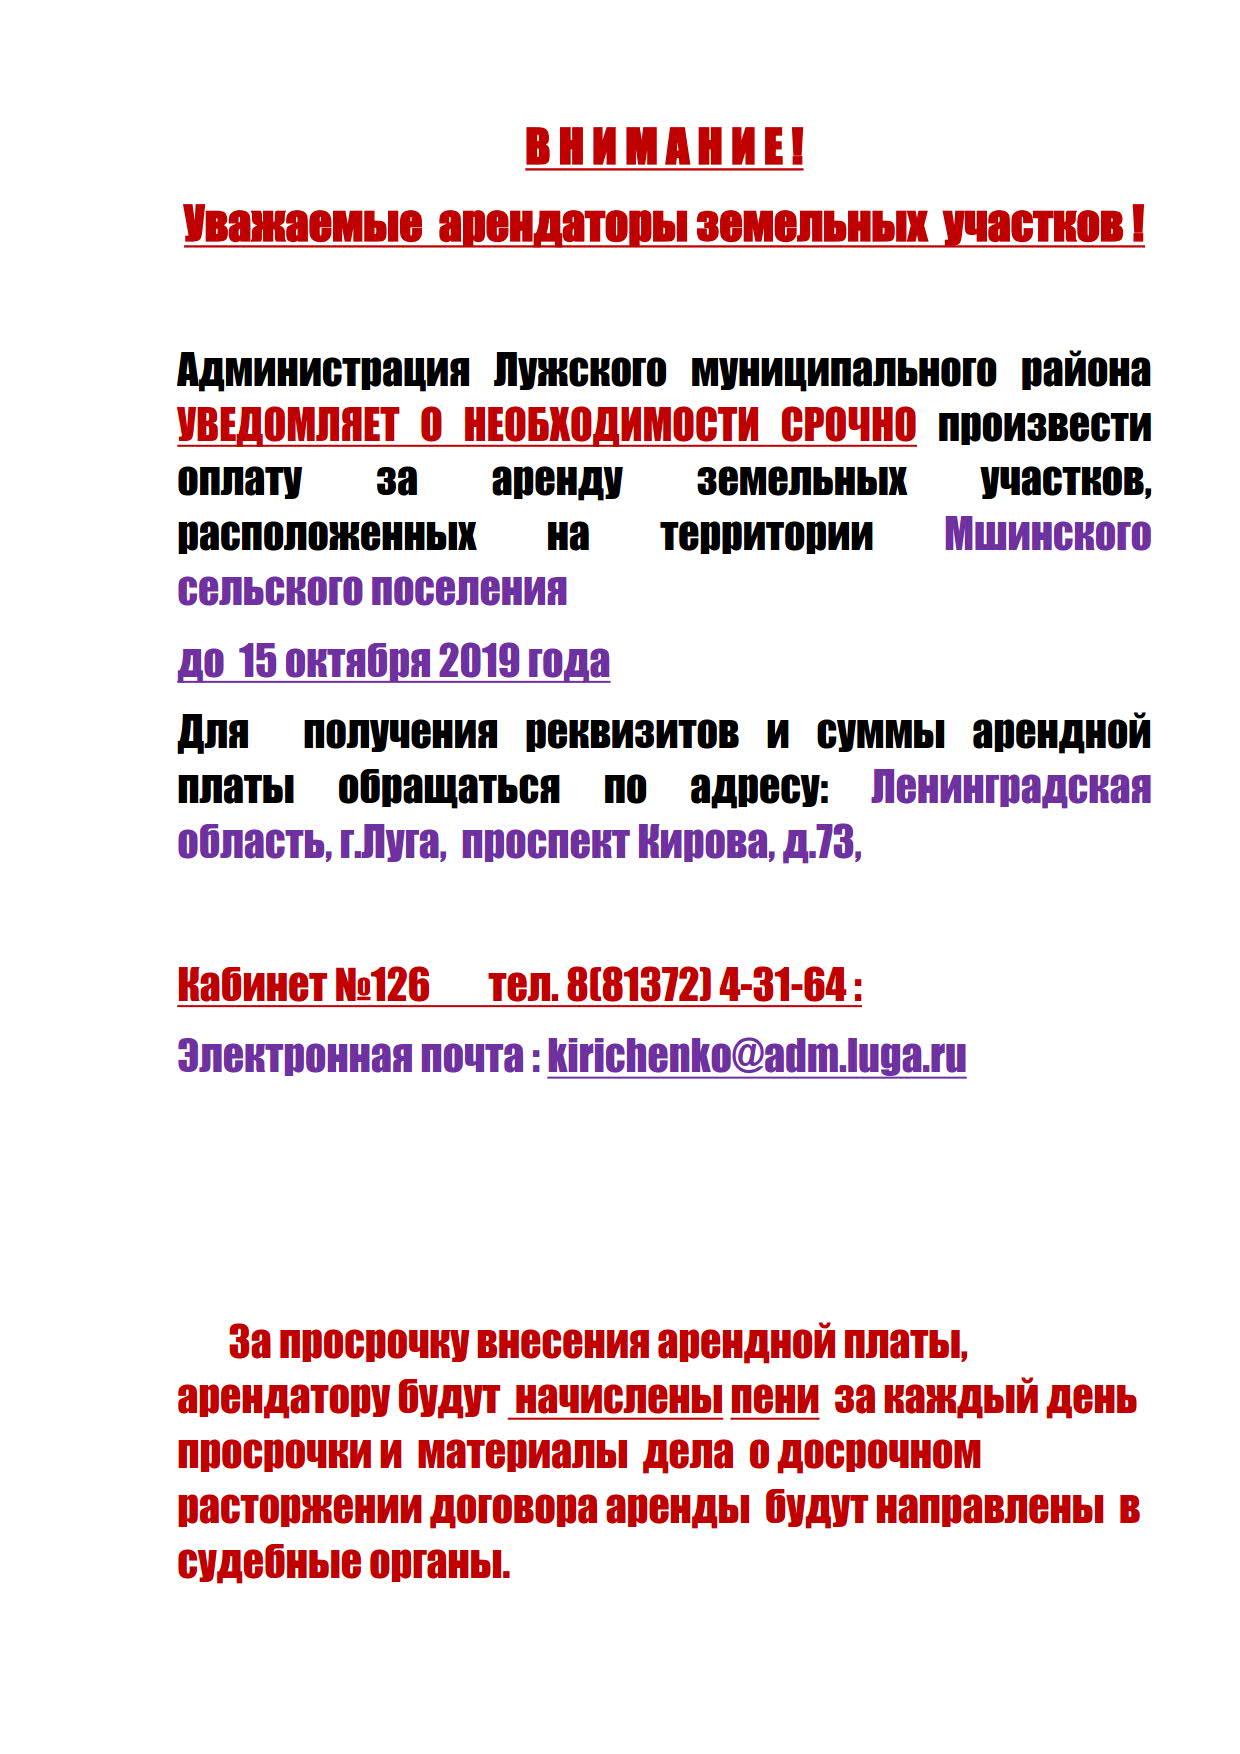 ОБЪЯВЛЕНИЕ аренда_1